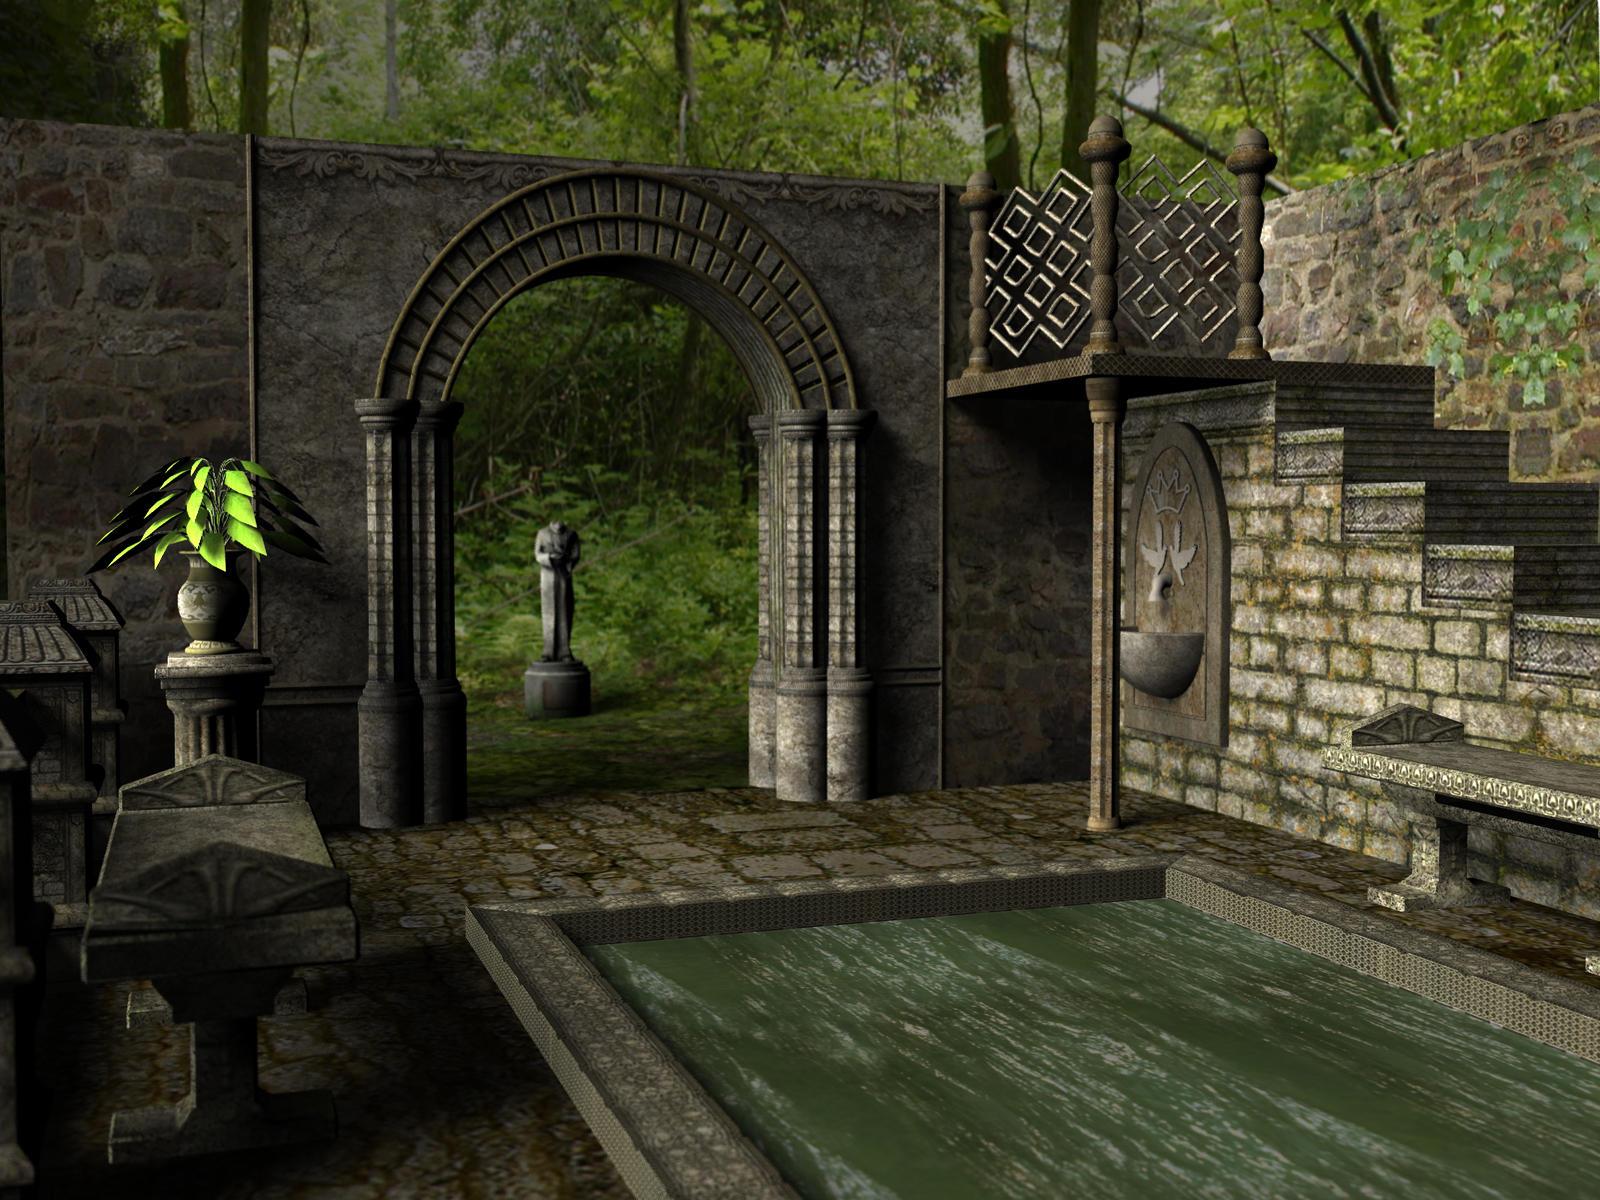 Stone Garden by shd-stock